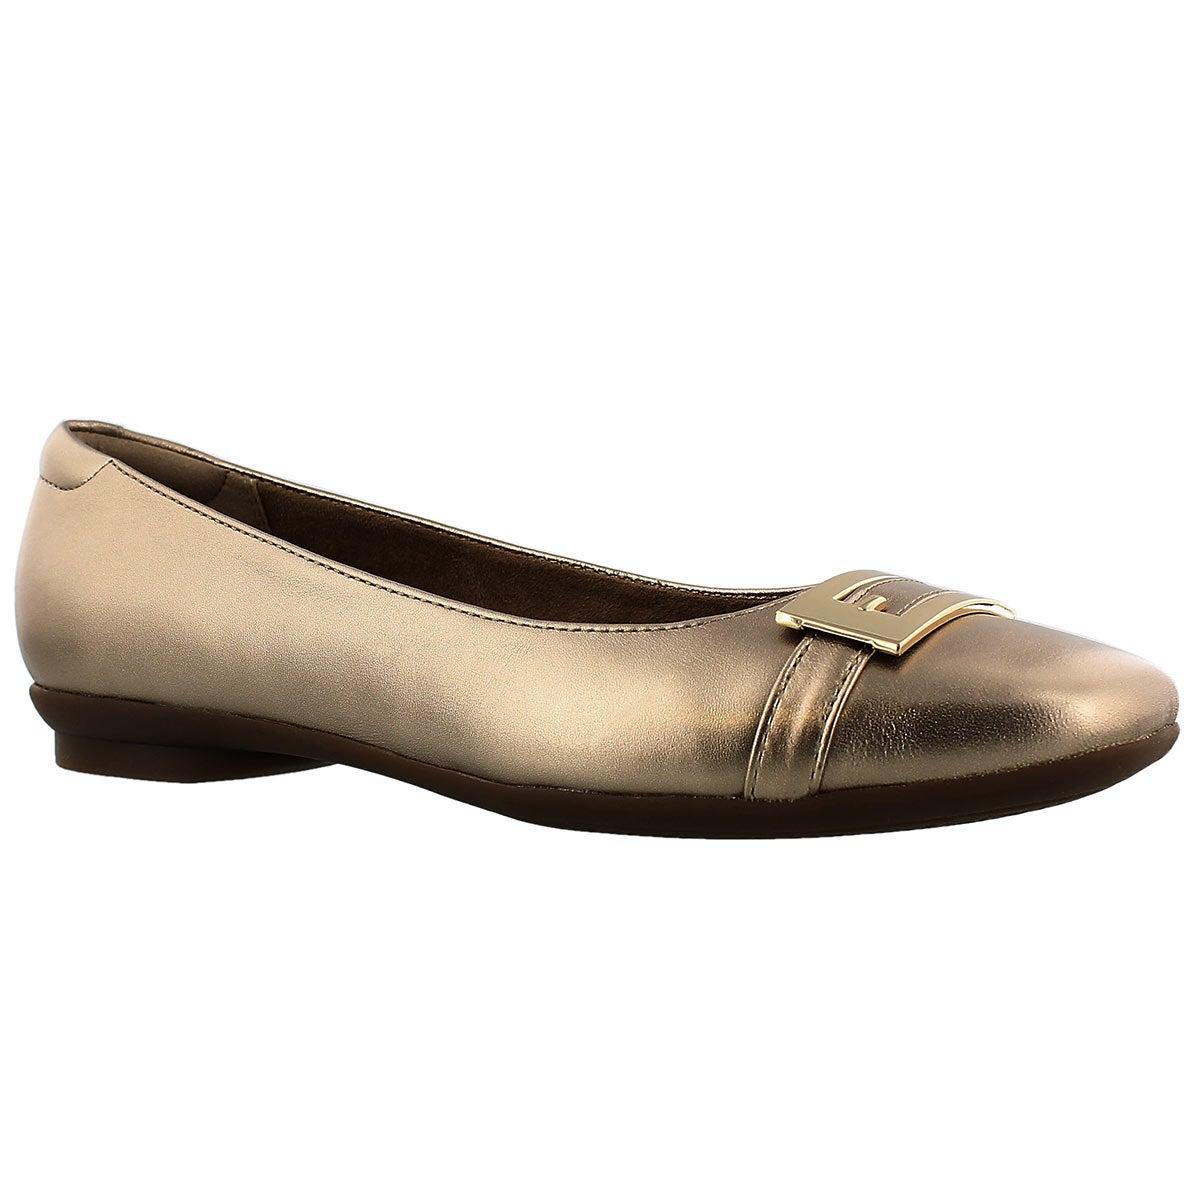 Lds Candra Glare gold dress flat - WIDE